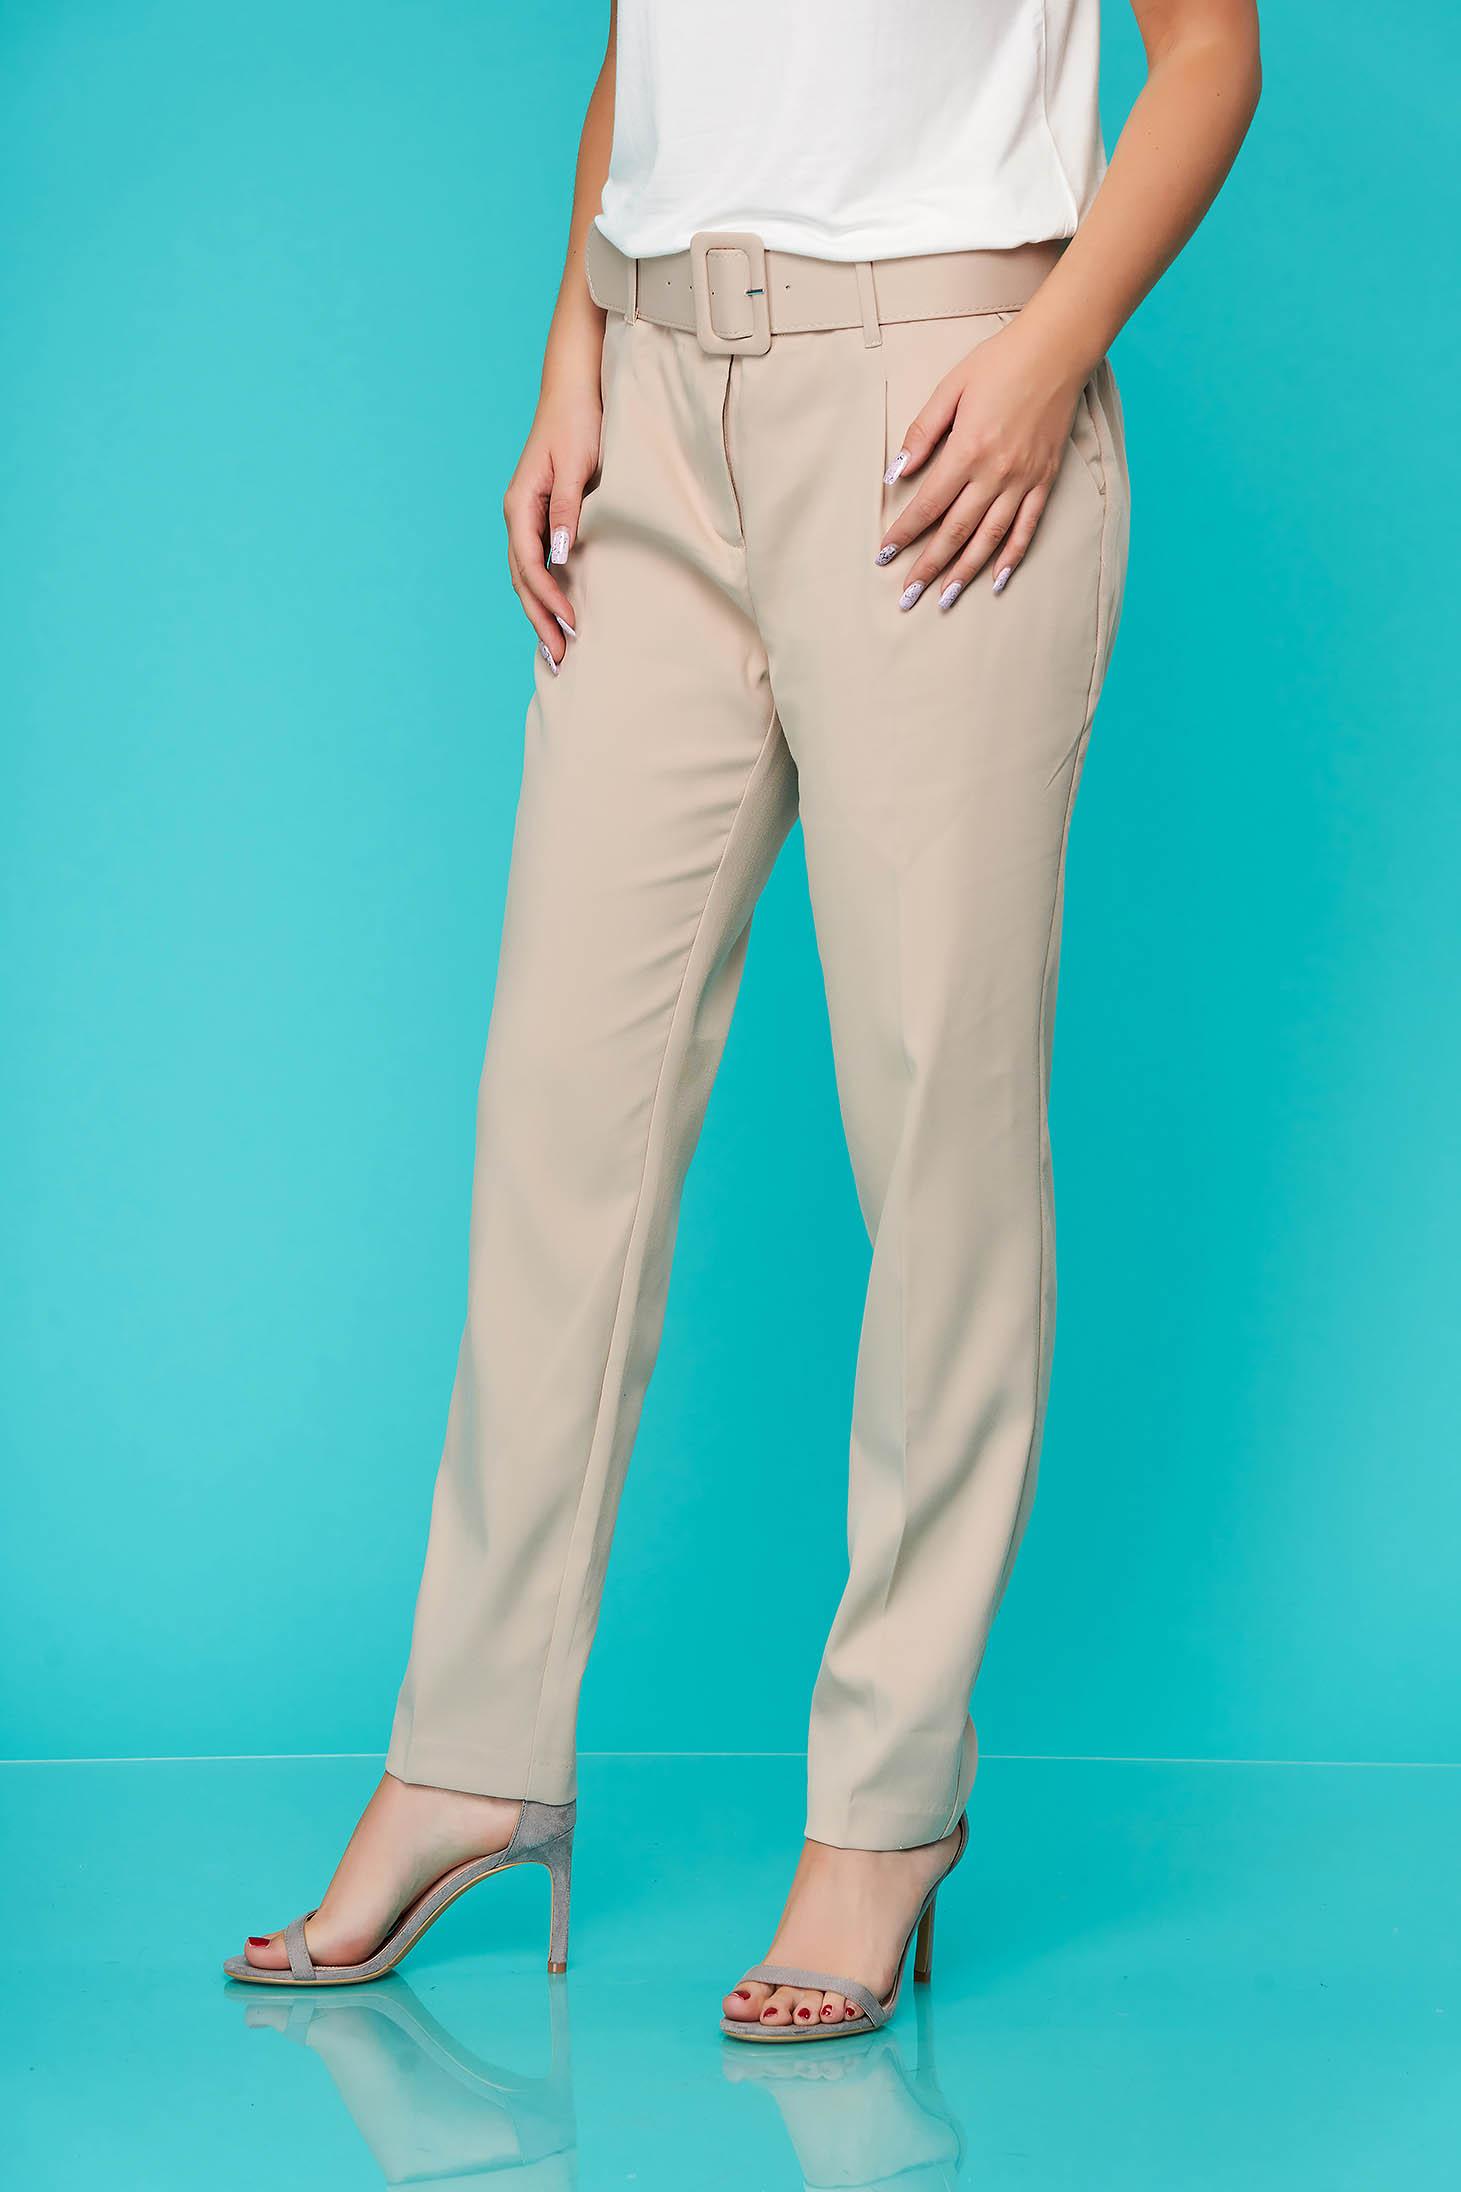 Cream trousers